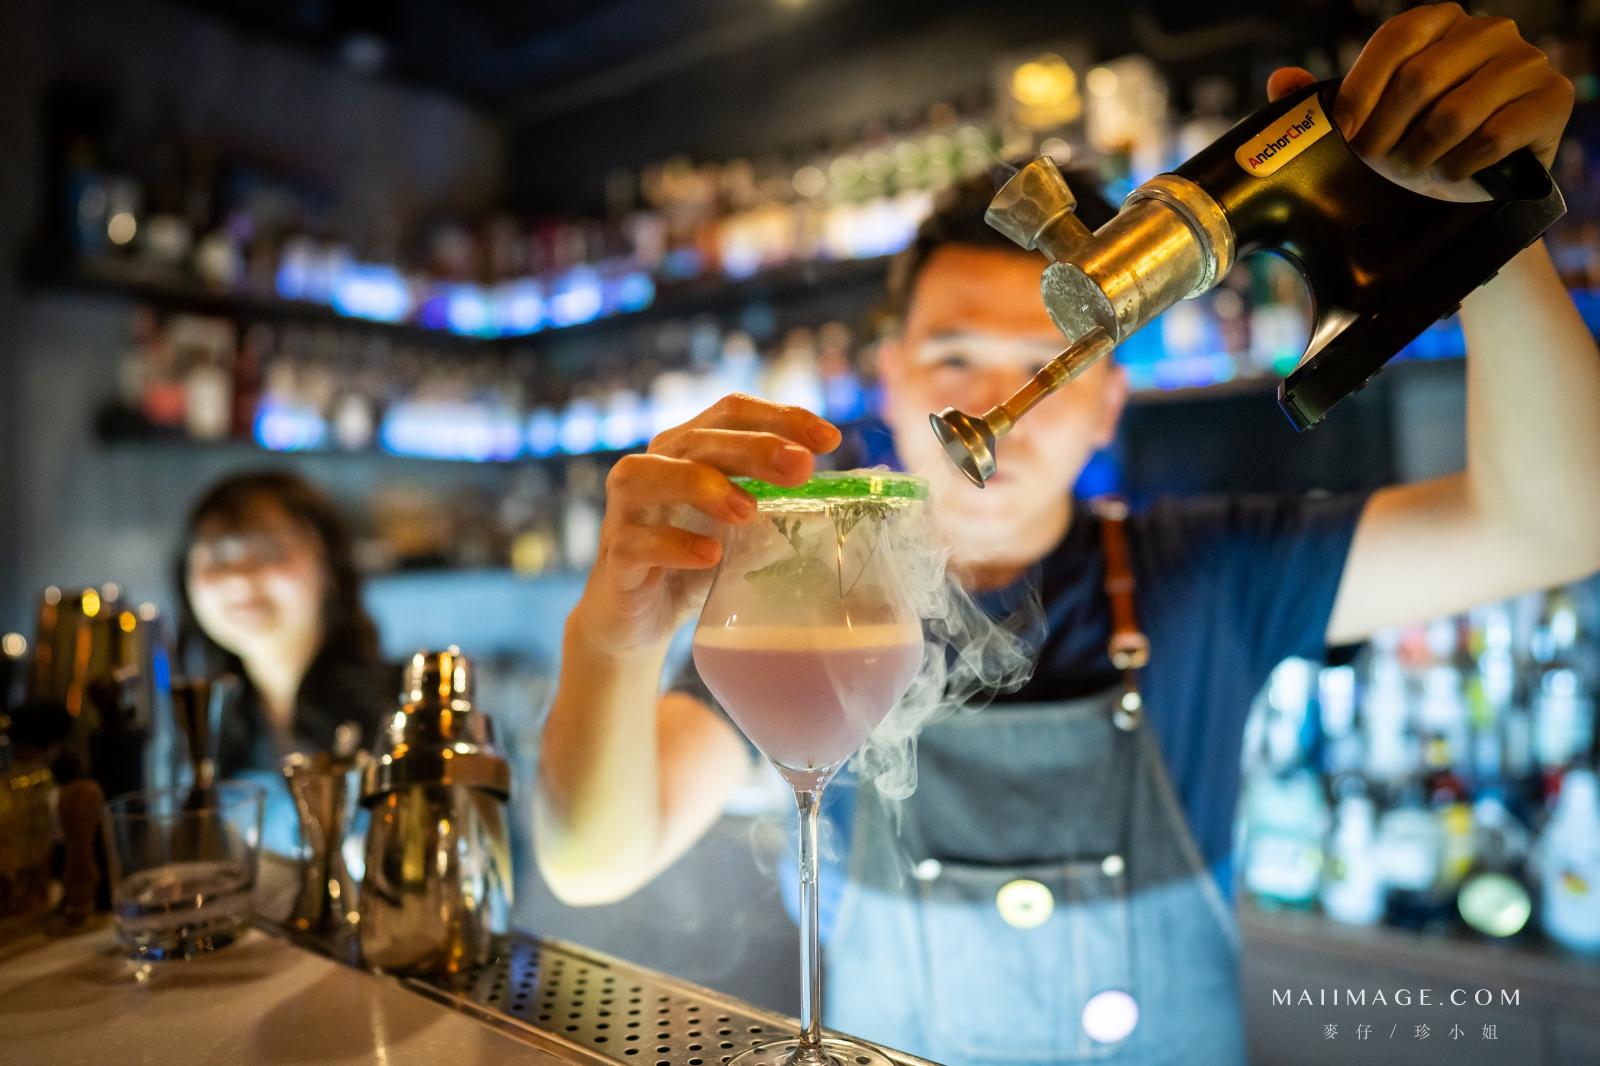 ONCE Cafe & Bar|西門町主打調酒與手沖咖啡的咖啡酒吧~玉蘭花香的琴酒你喝過嗎